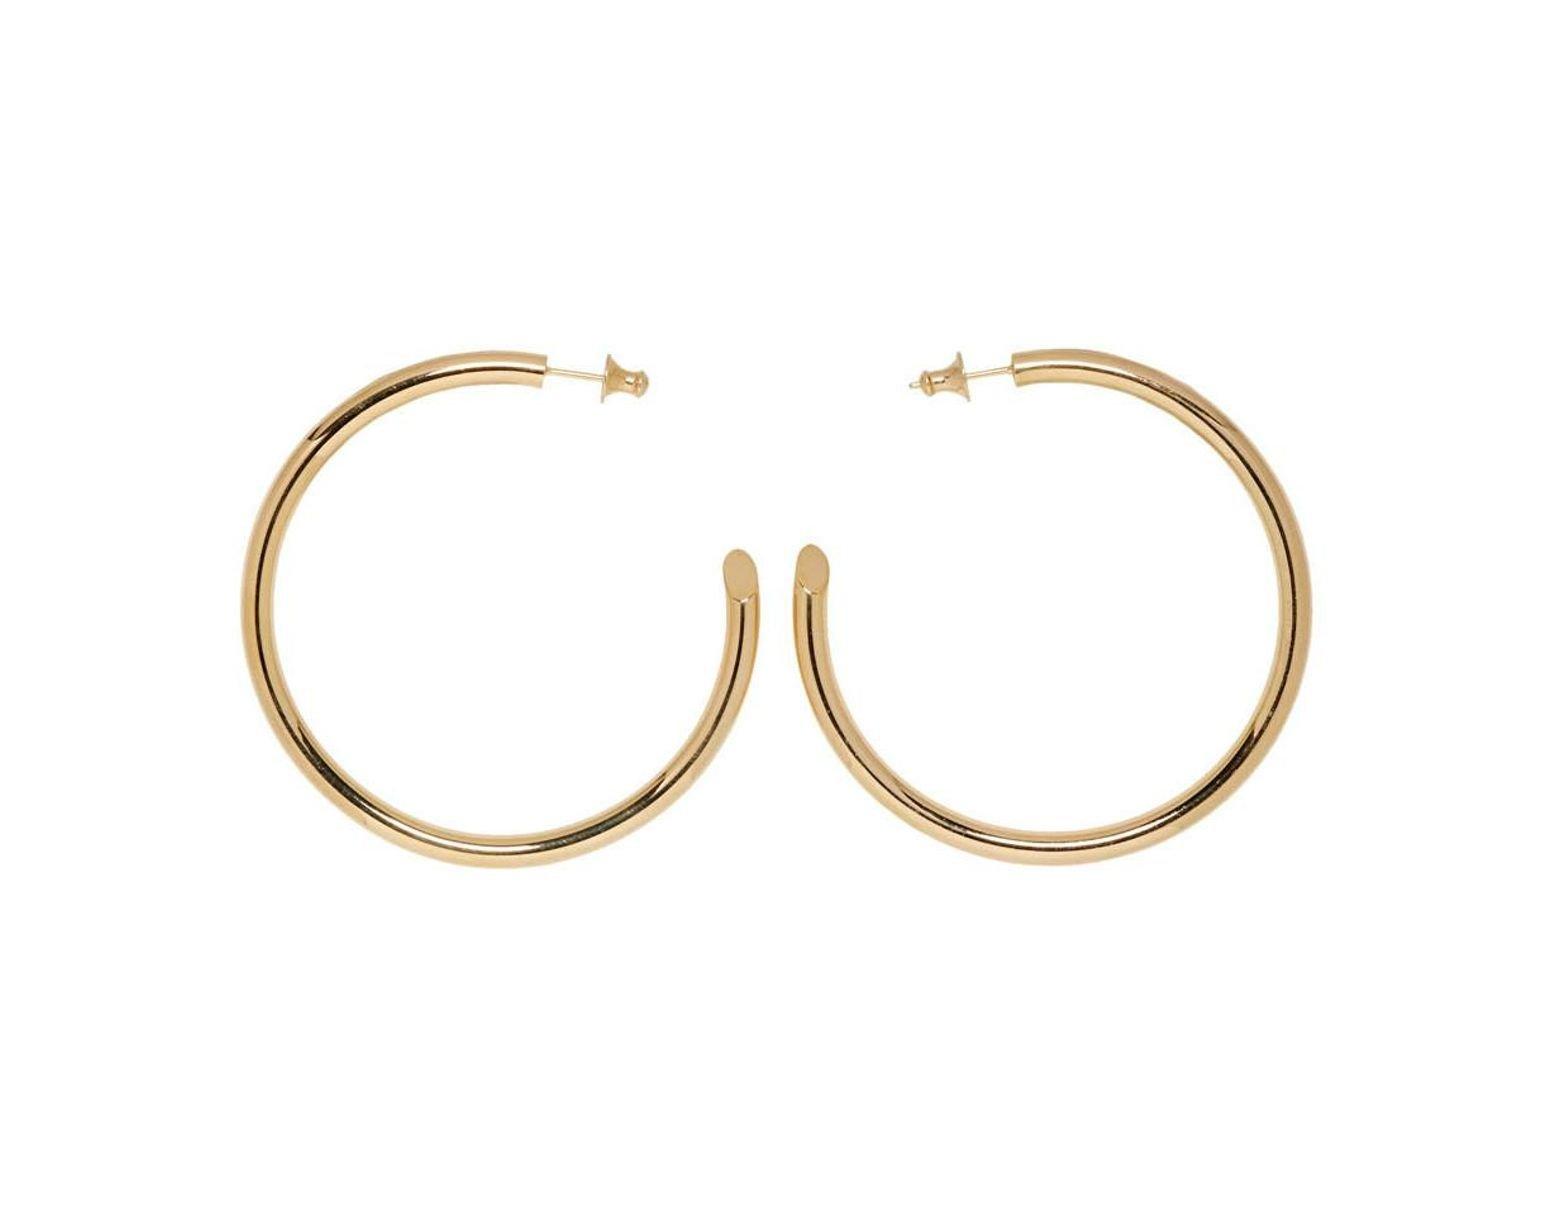 1b12d6b38 Undercover Gold Careering Edition Hoop Earrings in Metallic - Lyst